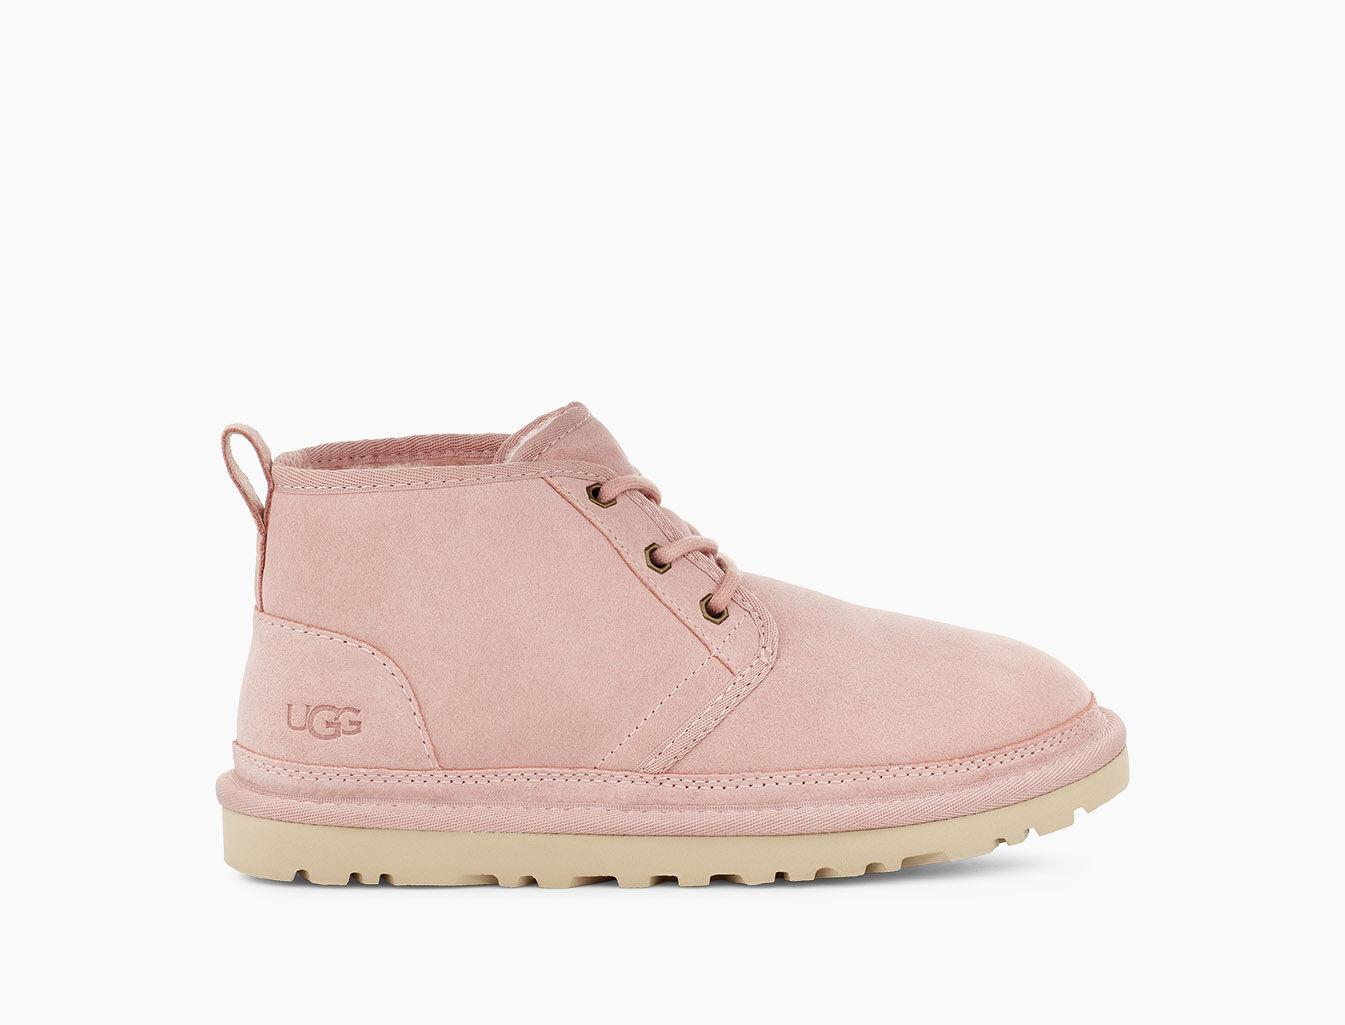 UGG® Neumel Boot for Women   UGG® EU